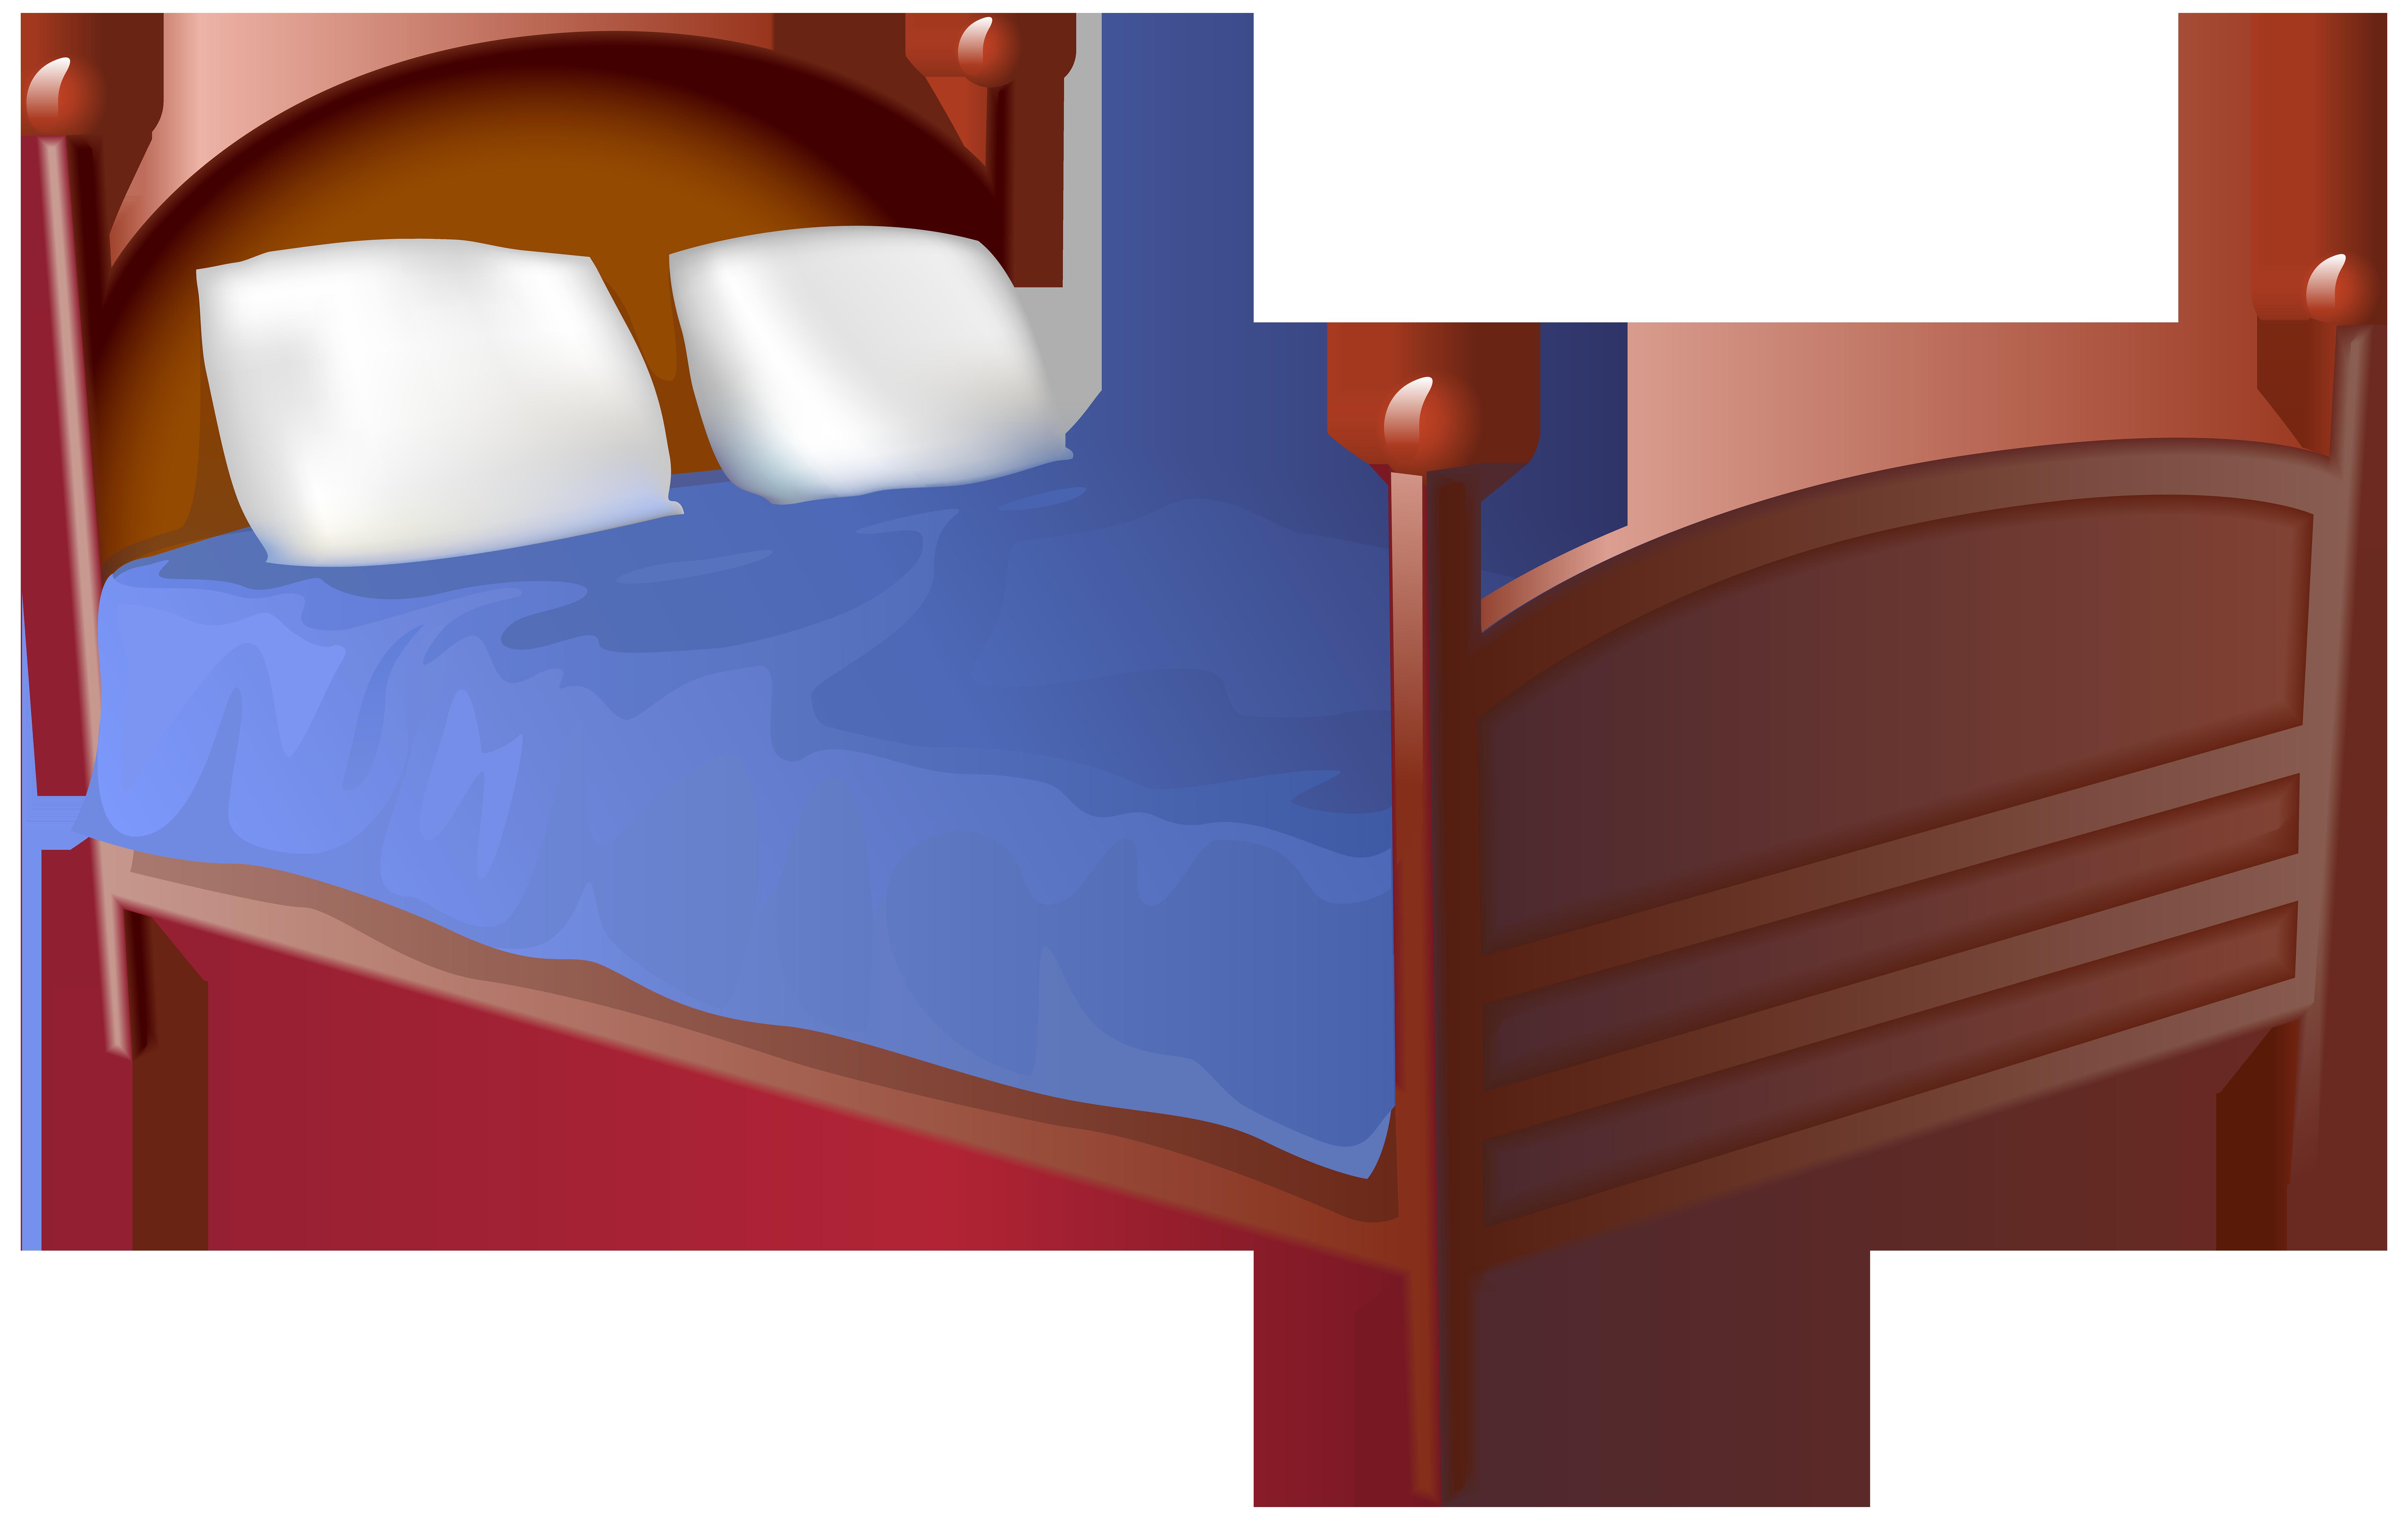 Bed Transparent PNG Clip Art Image.